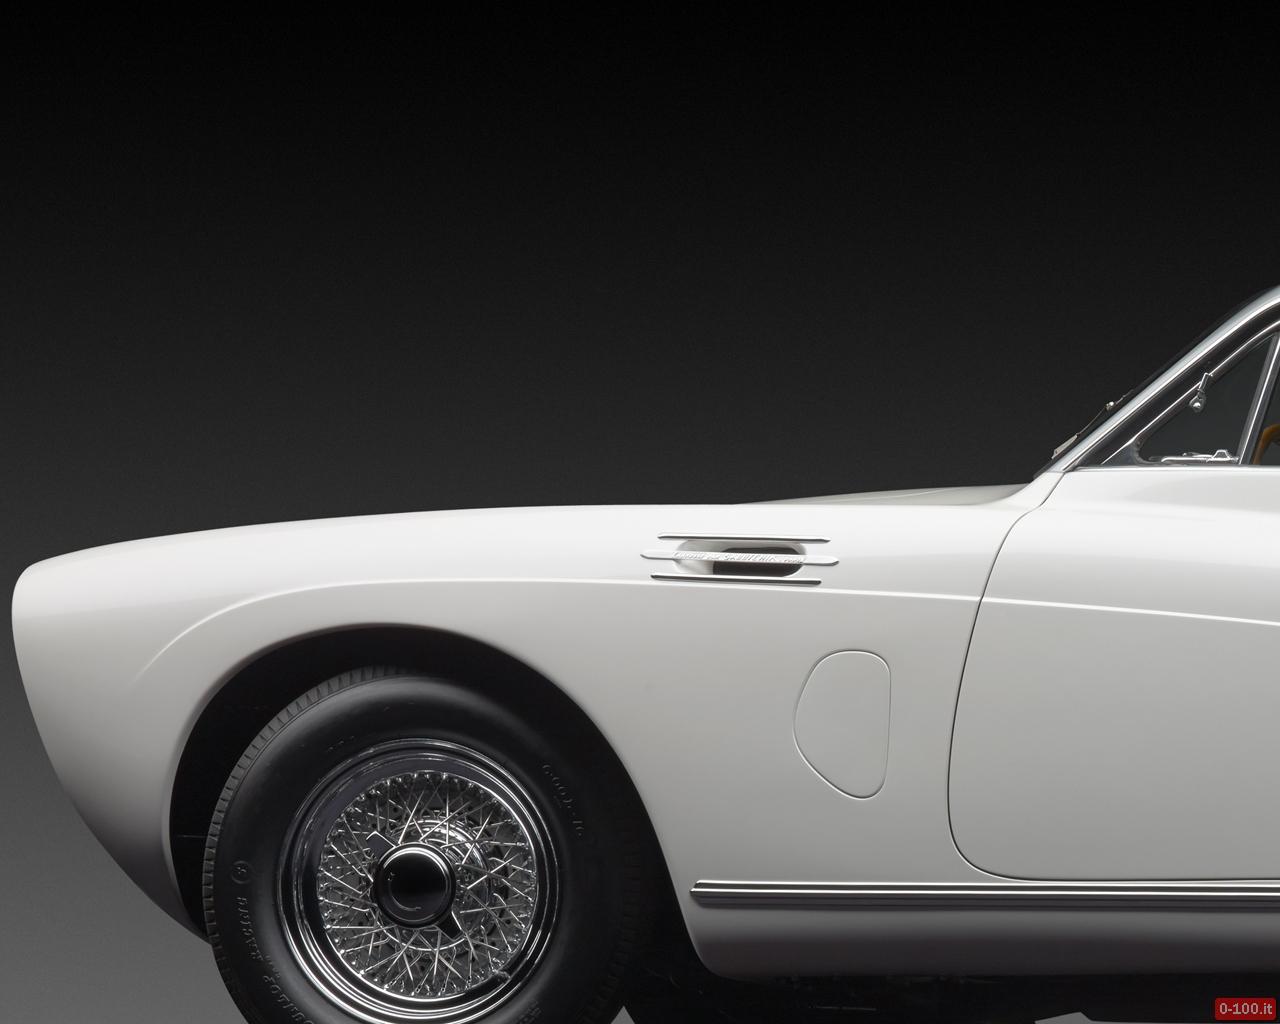 pegaso-z-102-berlinetta-serie-ii-by-carrosserie-j-saoutchik-rm-auctions_0-100_8